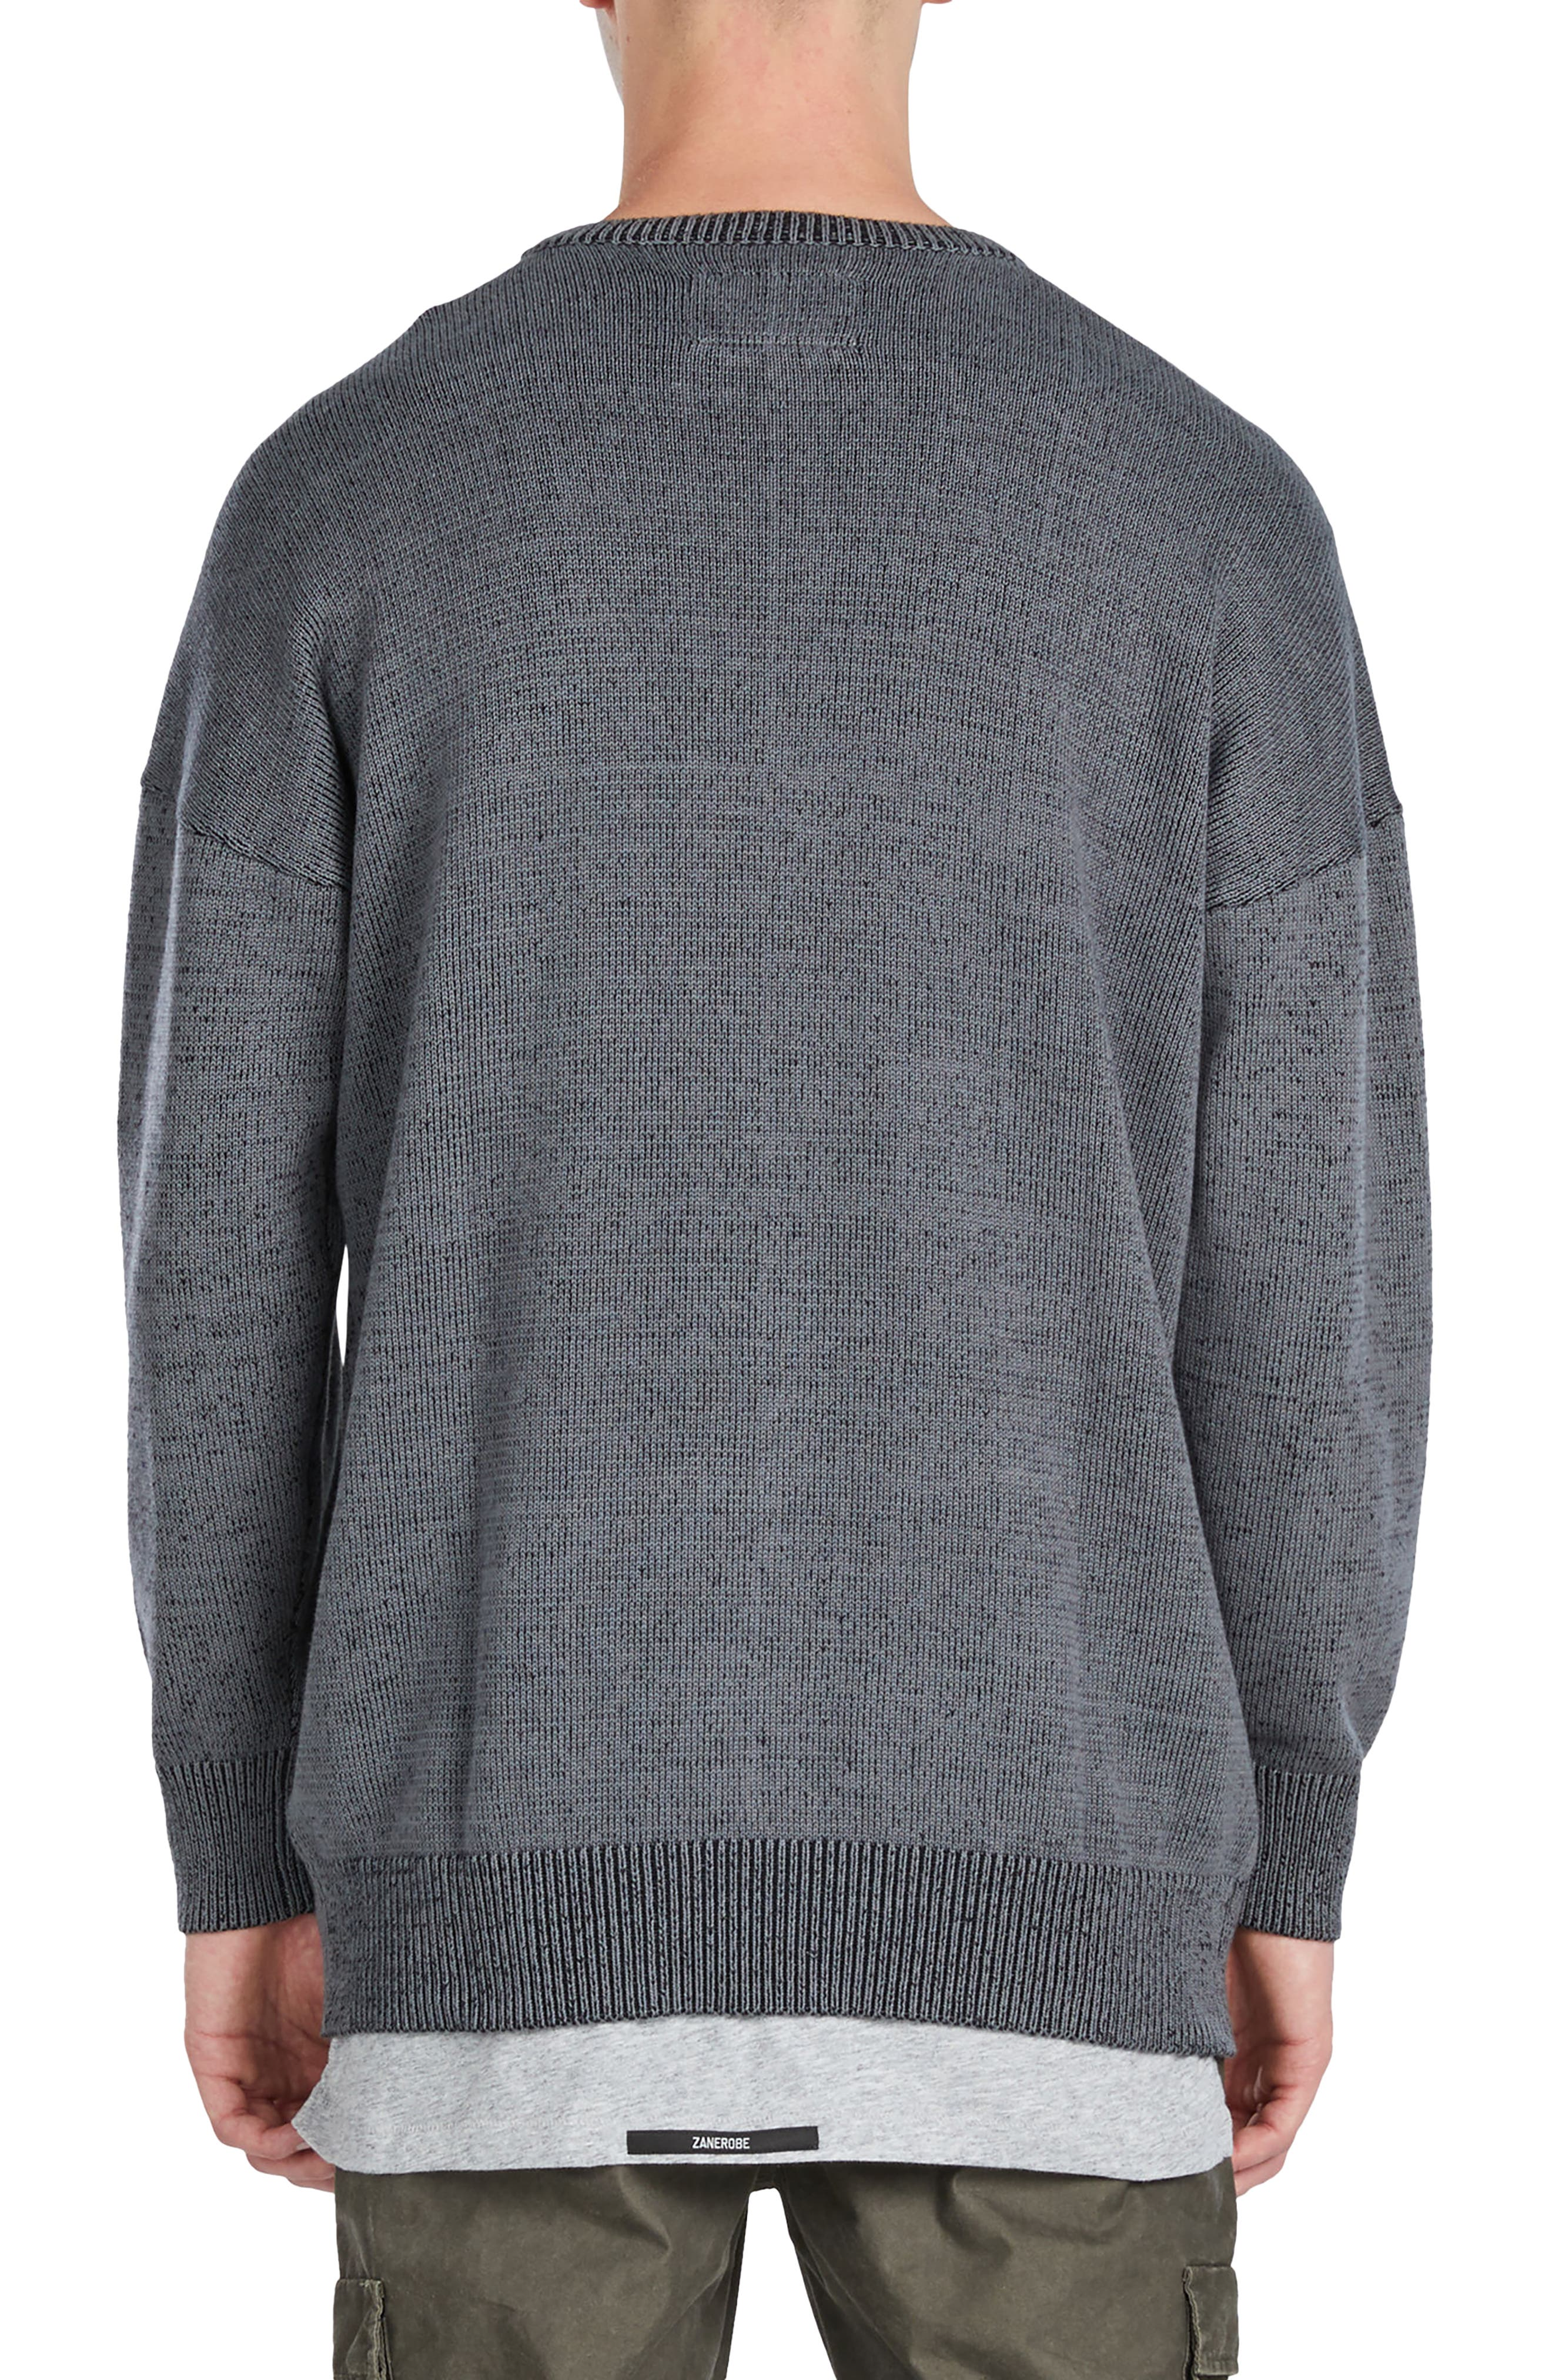 Cotch Knit Sweater,                             Alternate thumbnail 3, color,